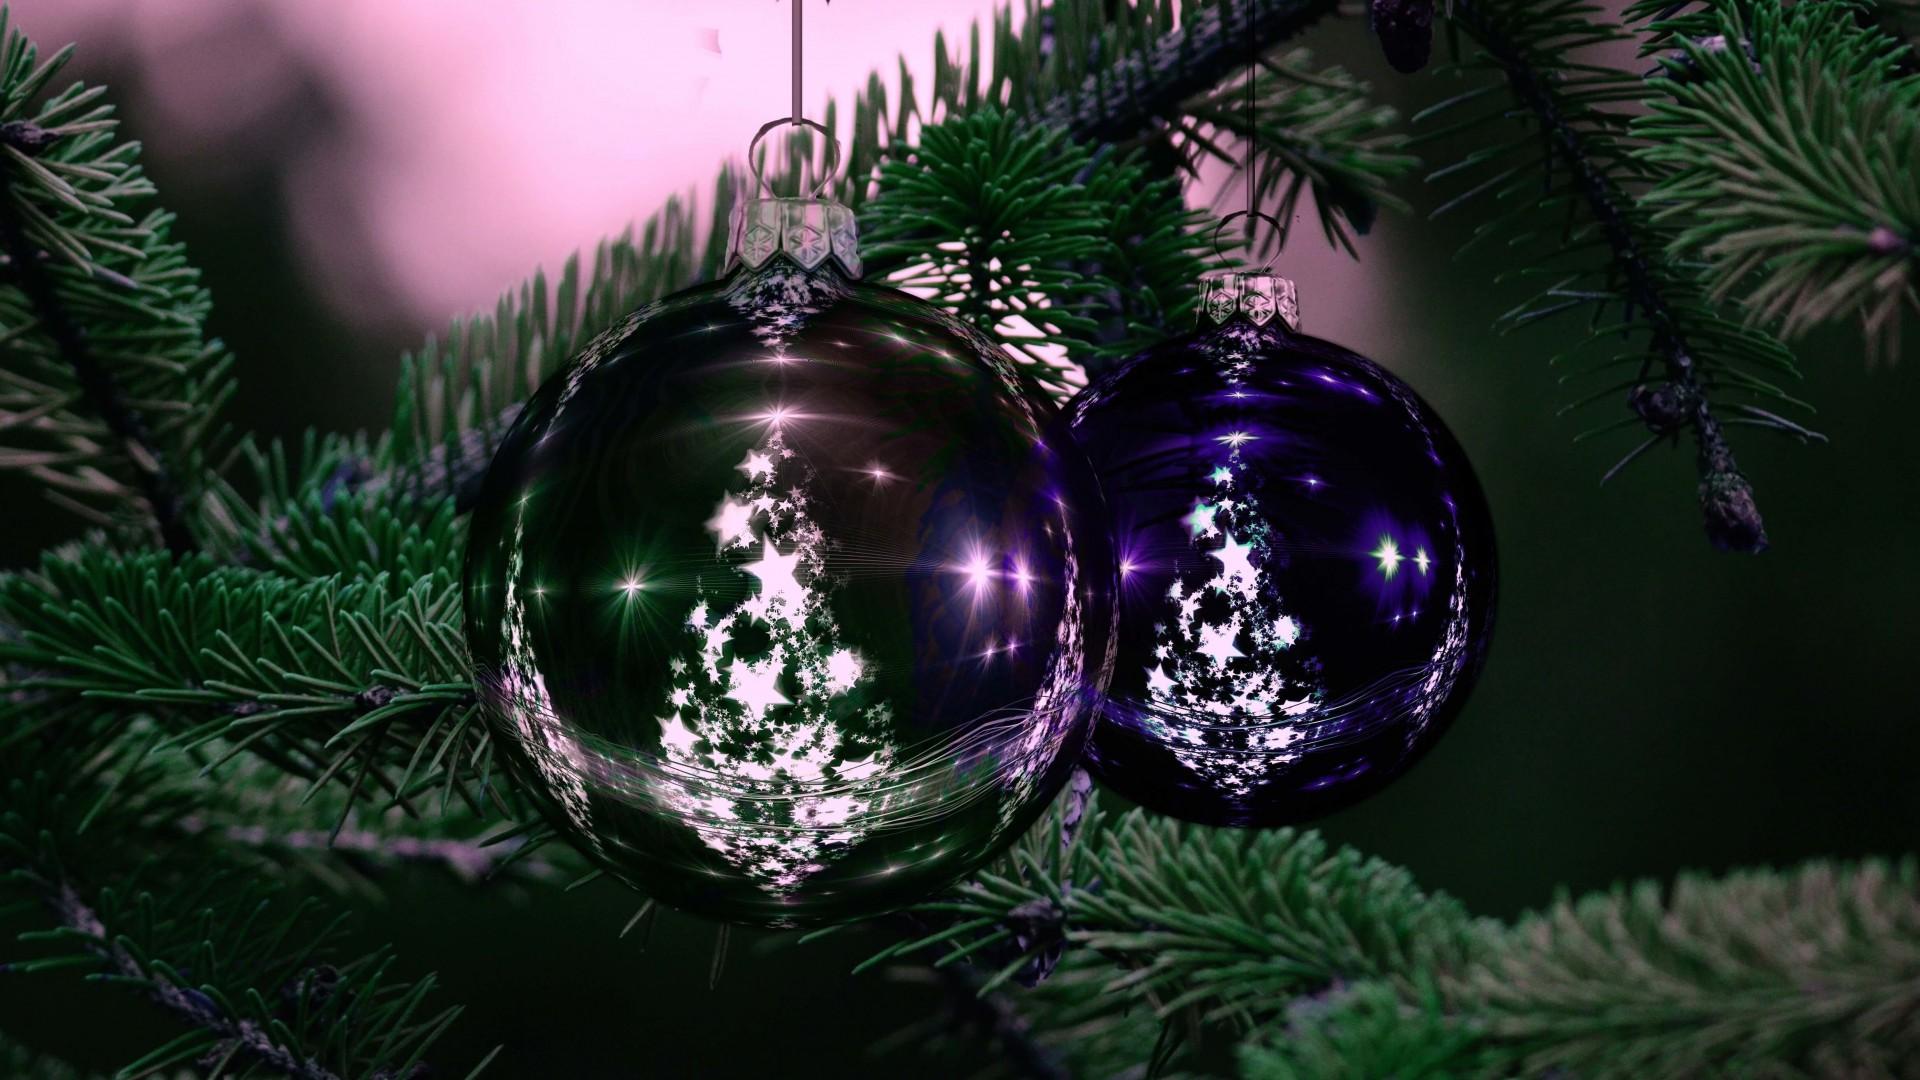 Hd wallpaper tree - Download Beautiful Christmas Tree Ornaments Hd Wallpaper